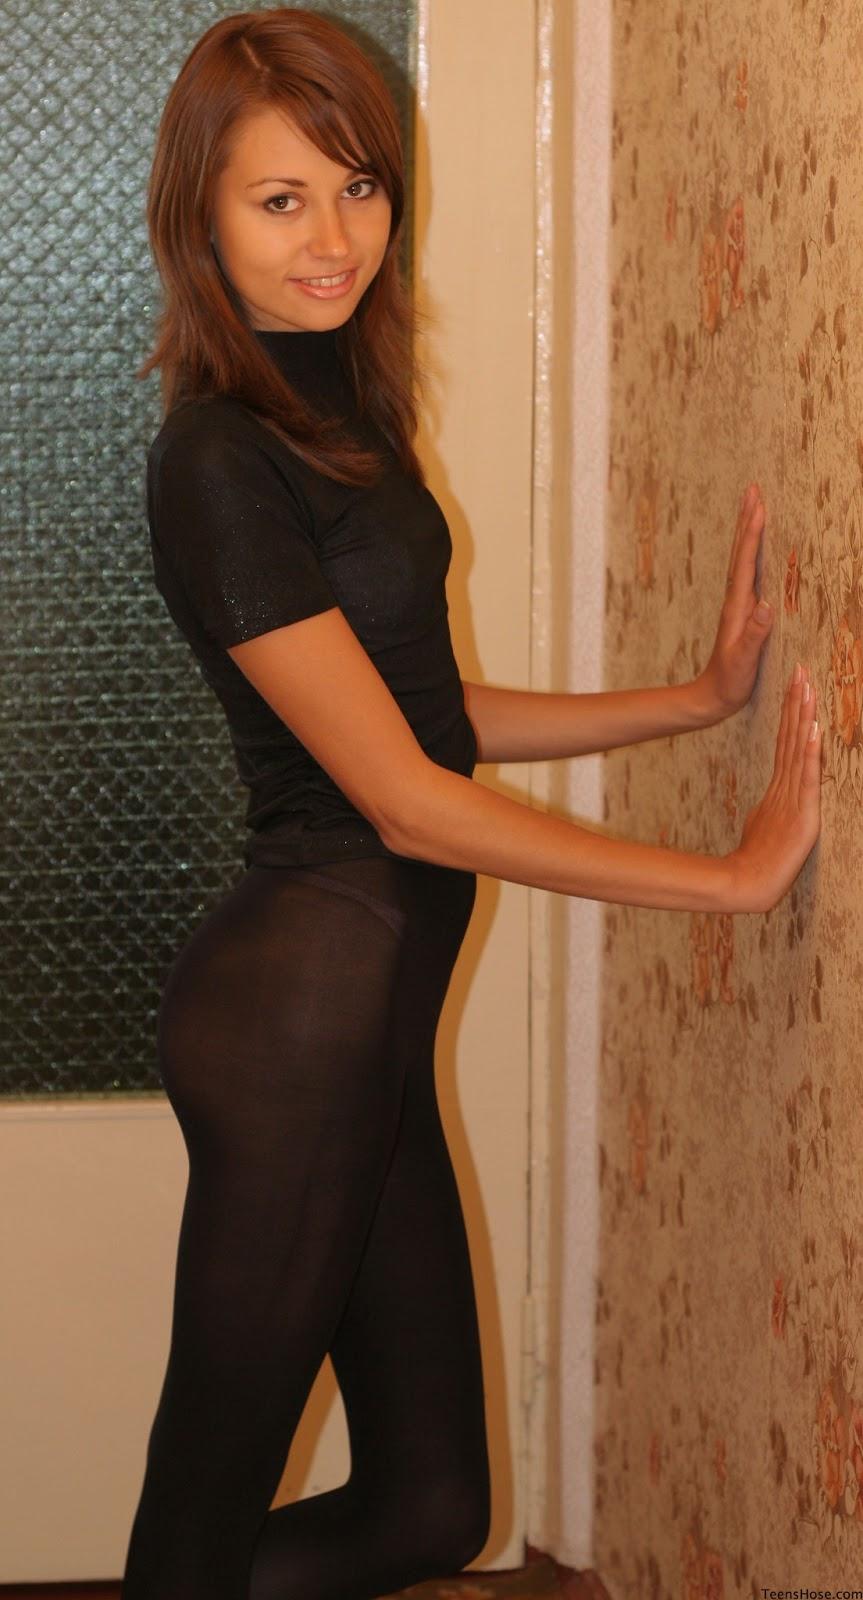 Big tits arab babe